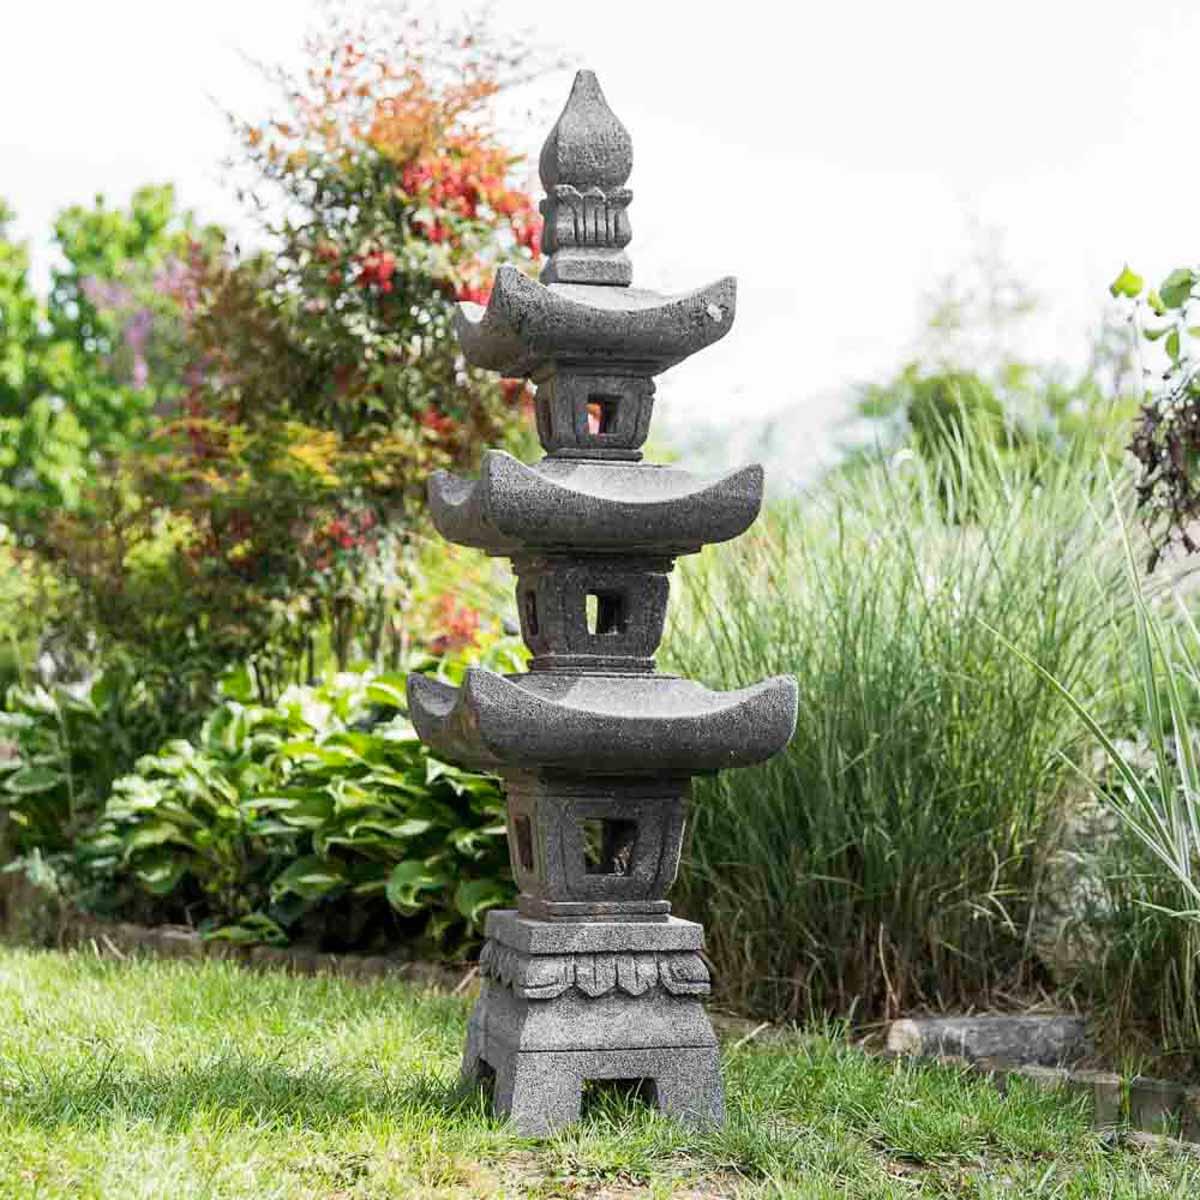 lampe de jardin en pierre de lave naturel h 1 m 10. Black Bedroom Furniture Sets. Home Design Ideas